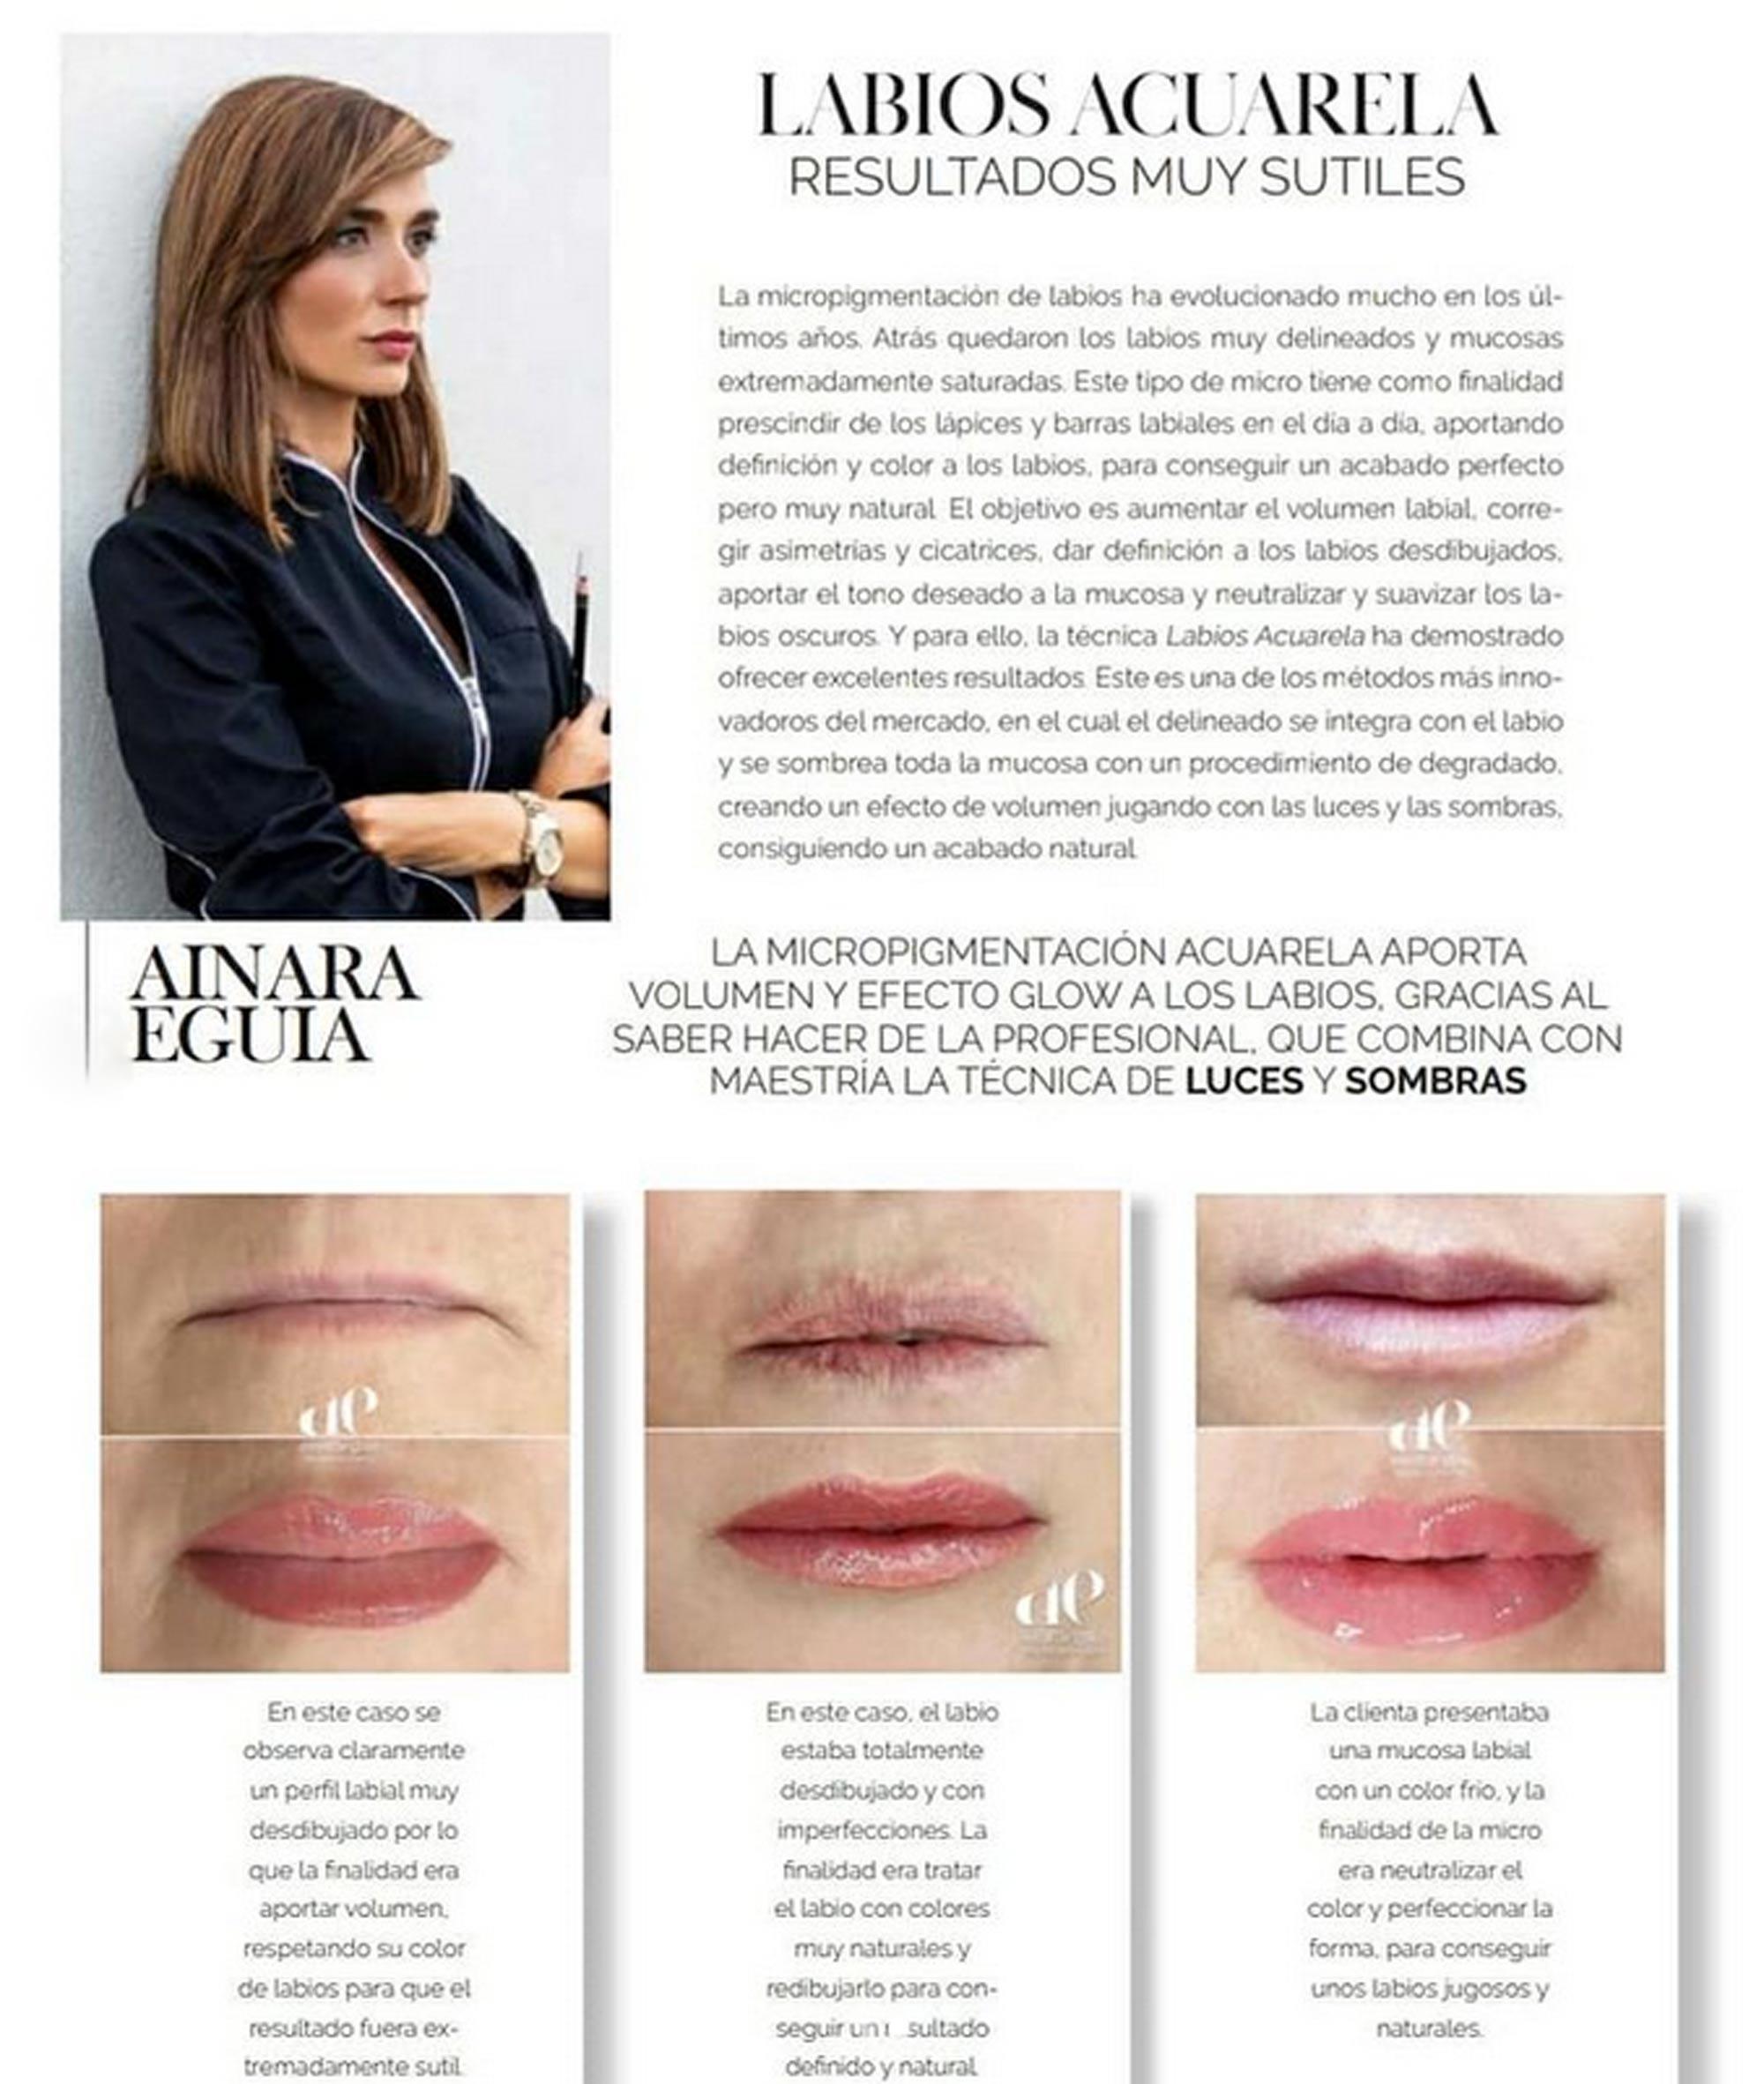 ainara eguia revista nueva estetica micropigmentacion microblanding softap formaciones cejas ojos labios capilar cicatrices bilbao